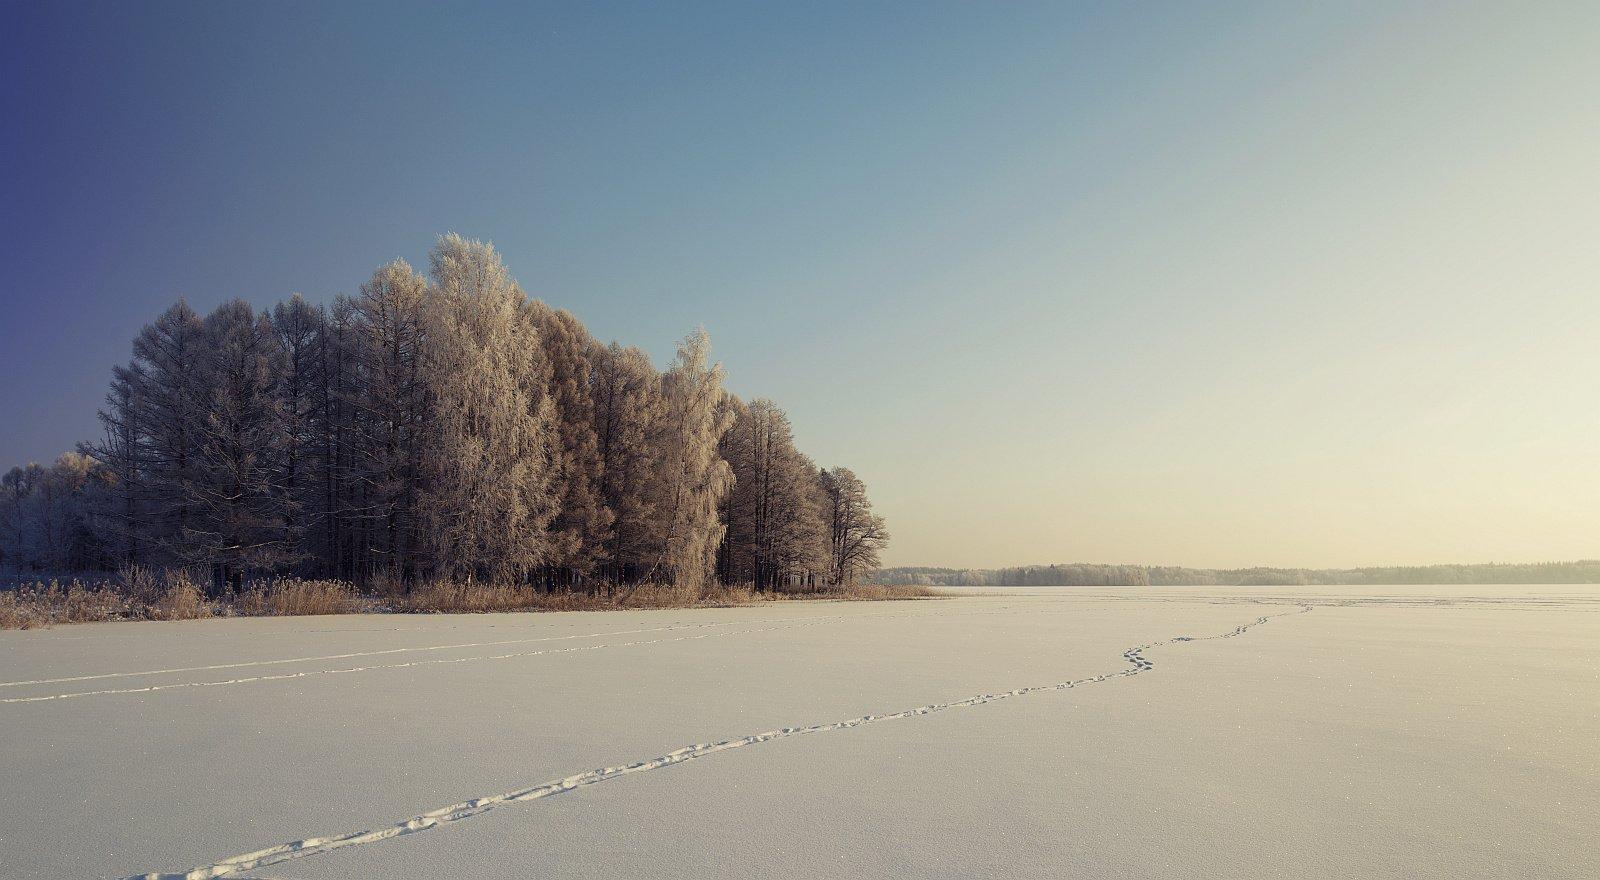 Пейзаж, природа, зима, Ефимов Александр